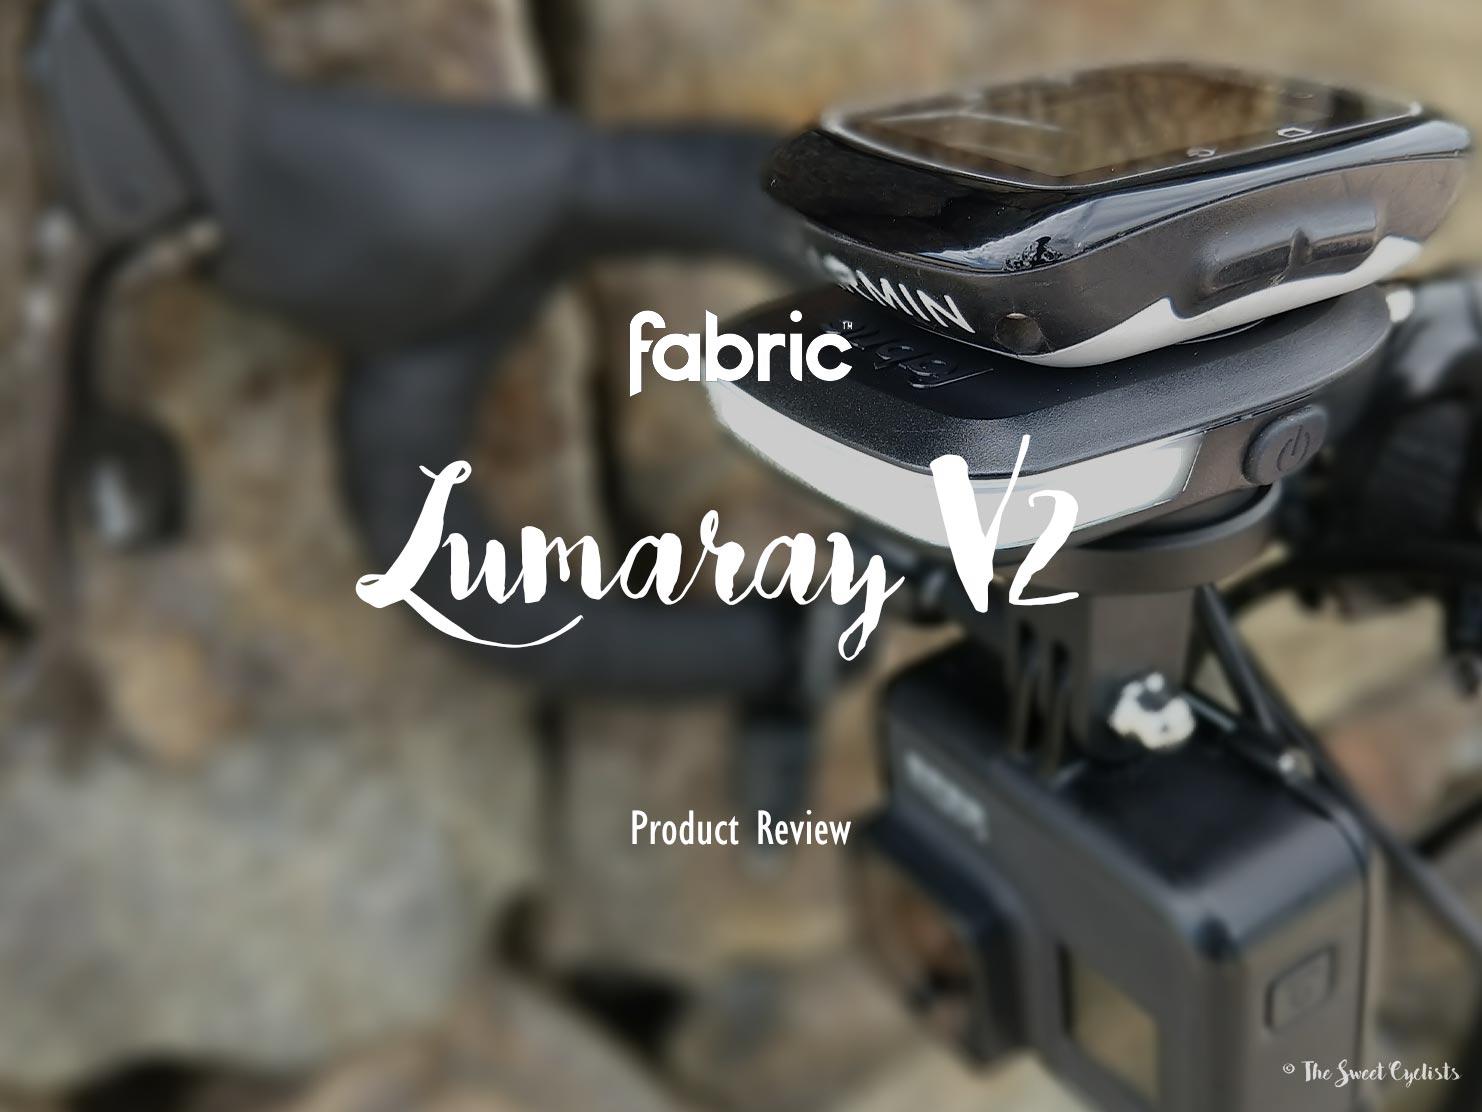 Fabric Lumaray, a clever daytime bike light